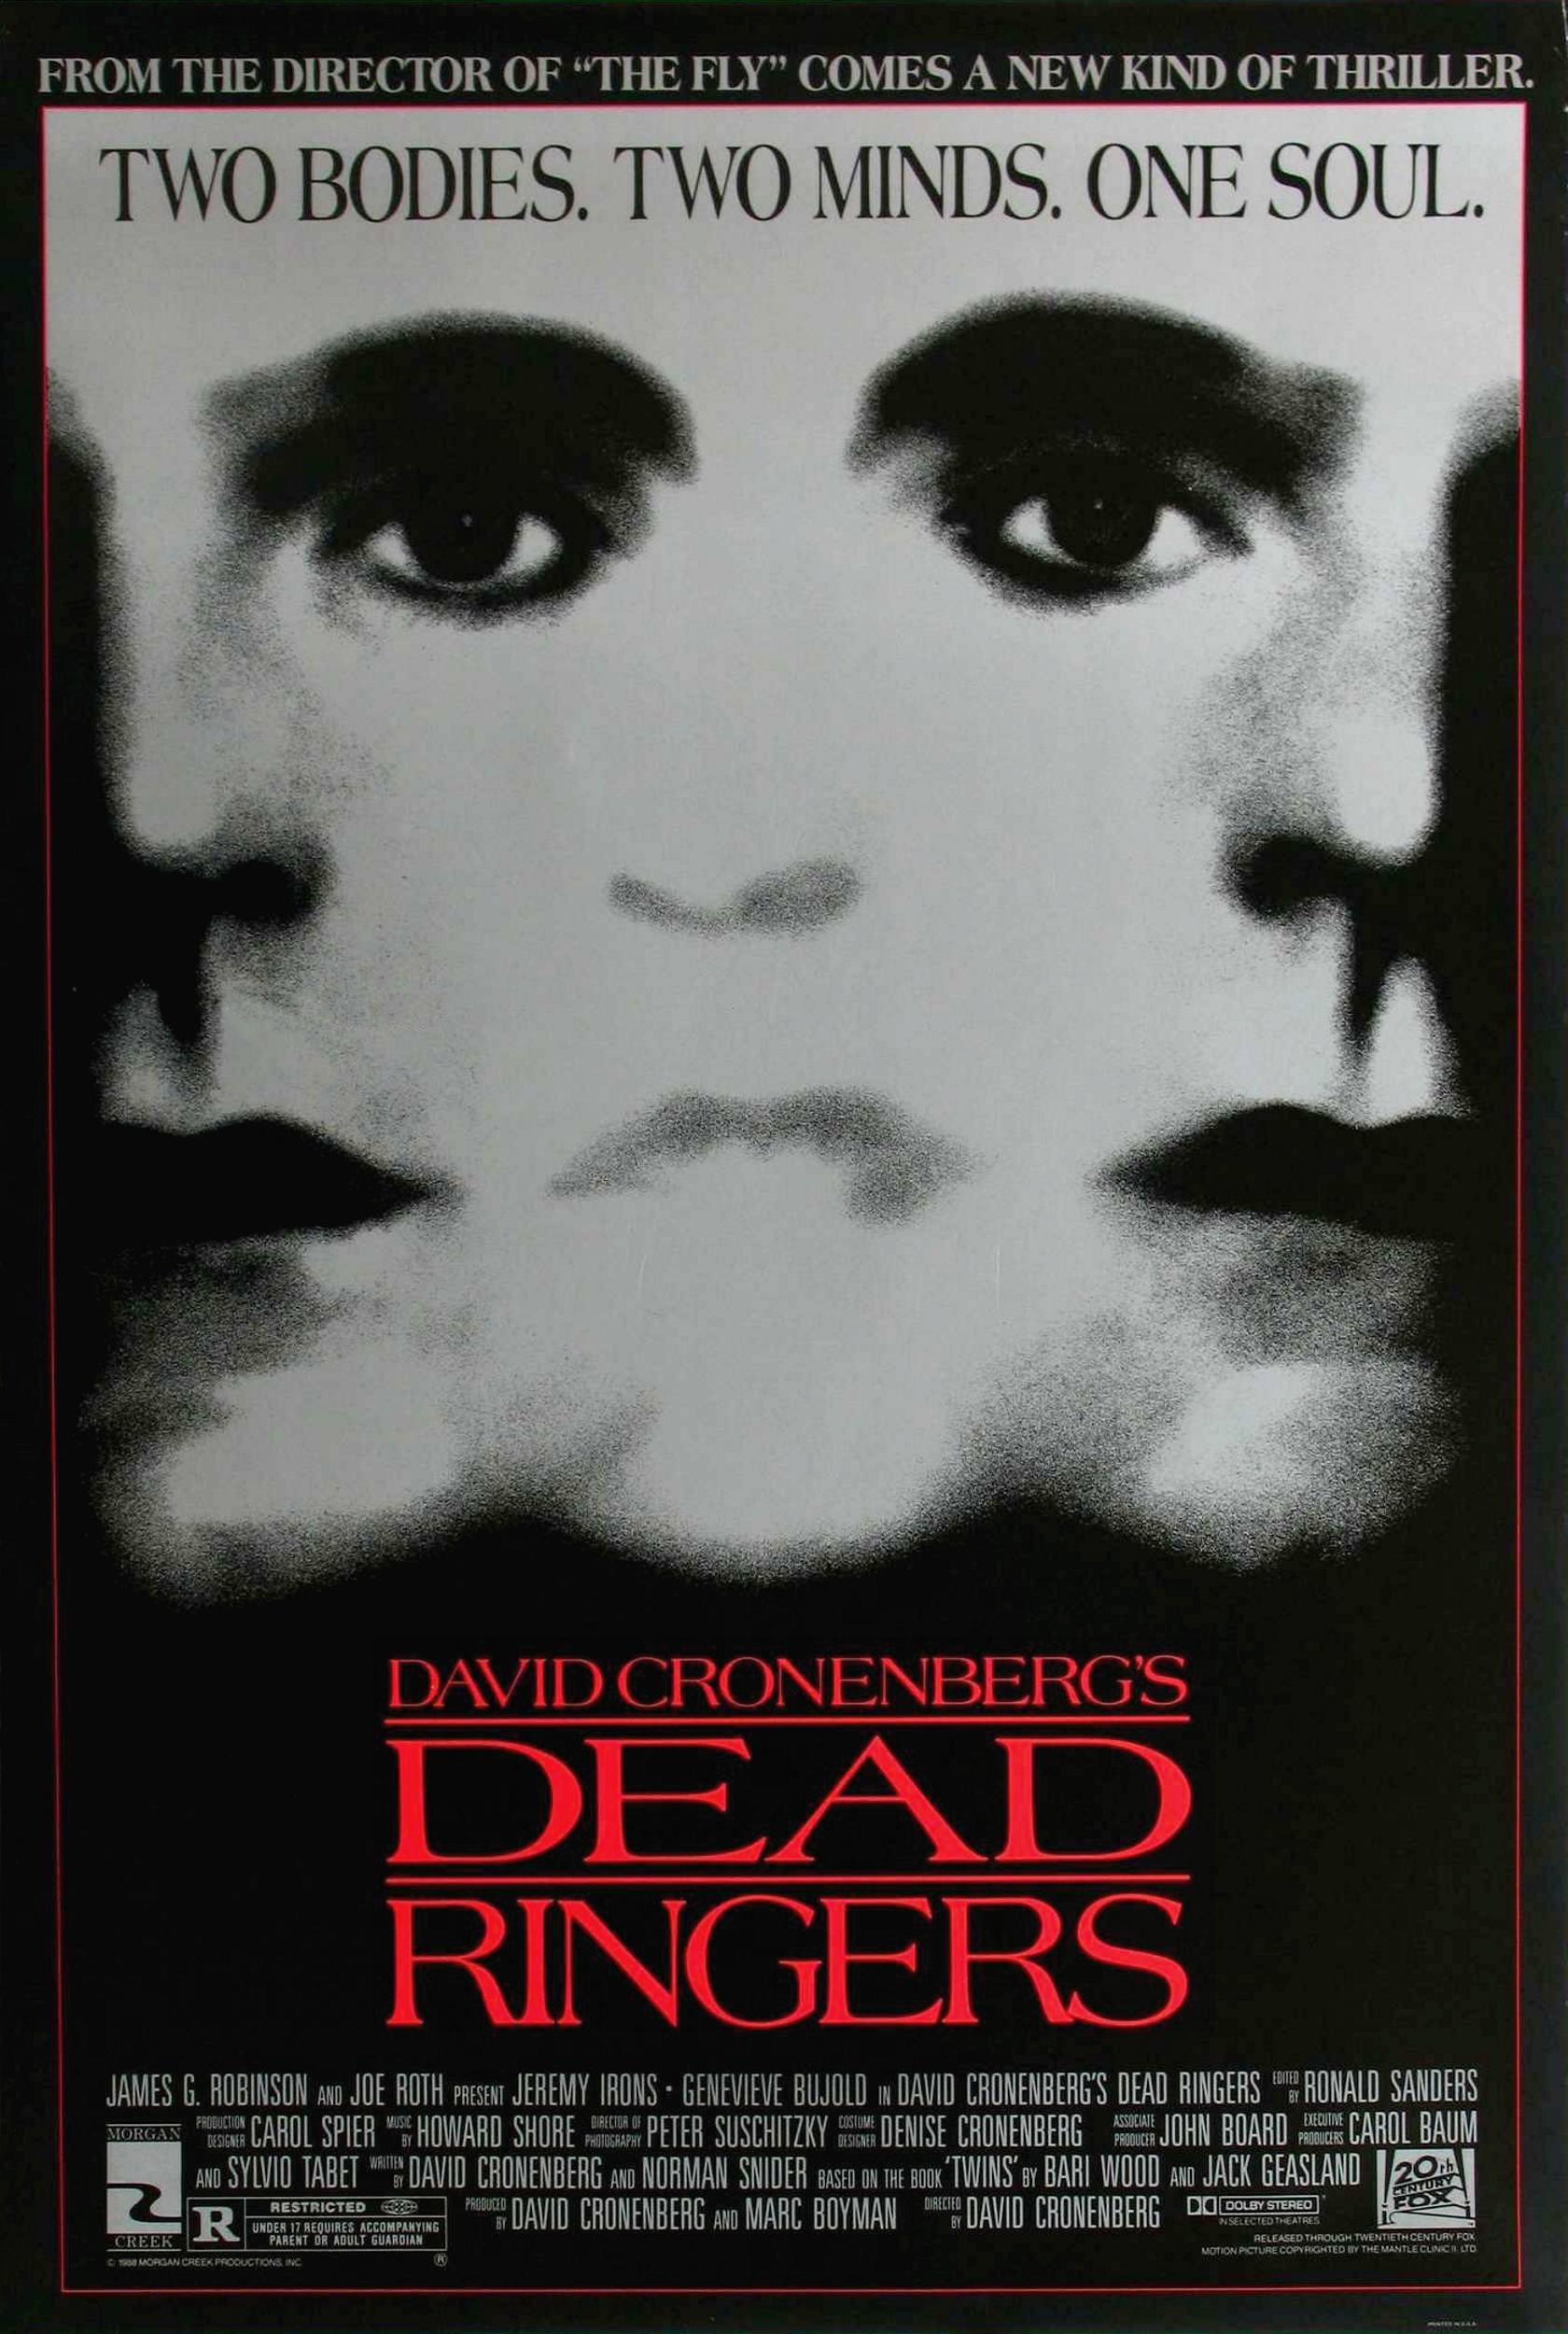 Affichons les affiches - Page 11 Dead_ringers_poster